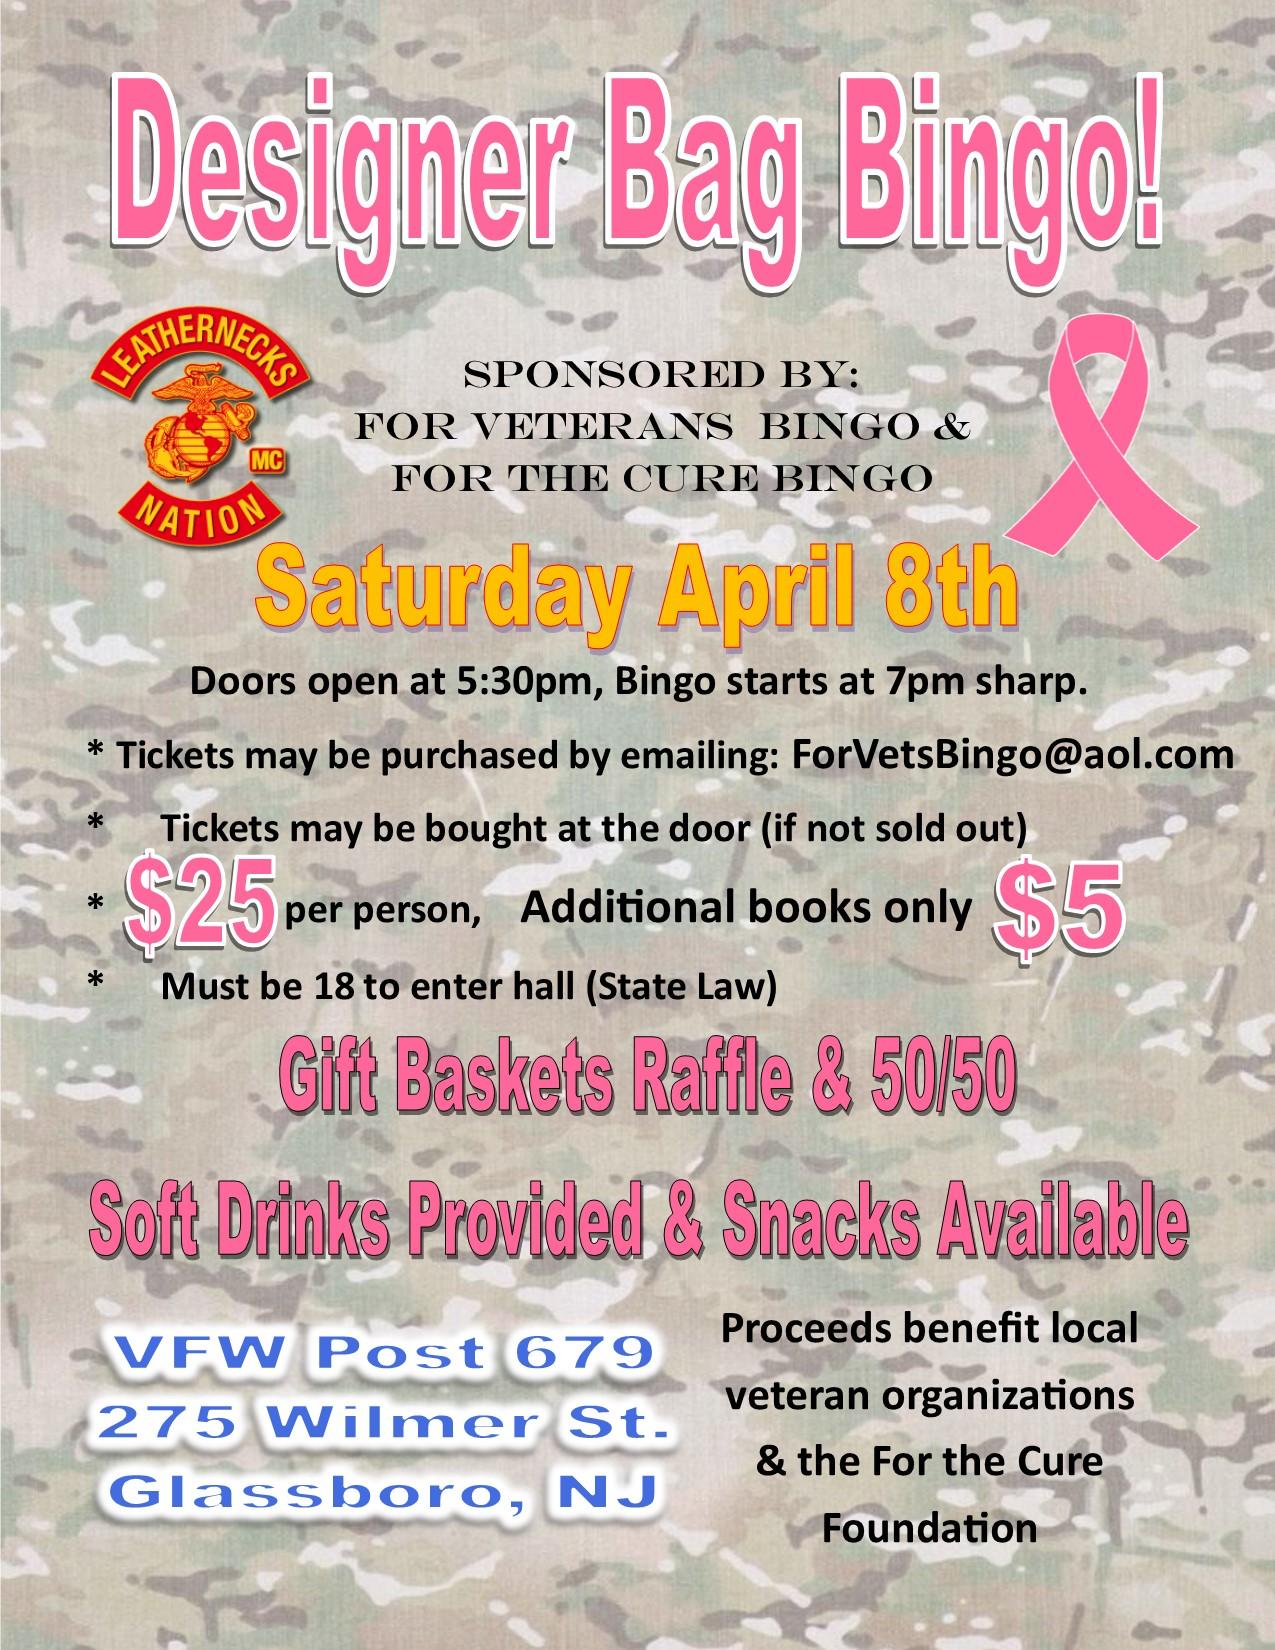 Veterans Designer Bag Bingo